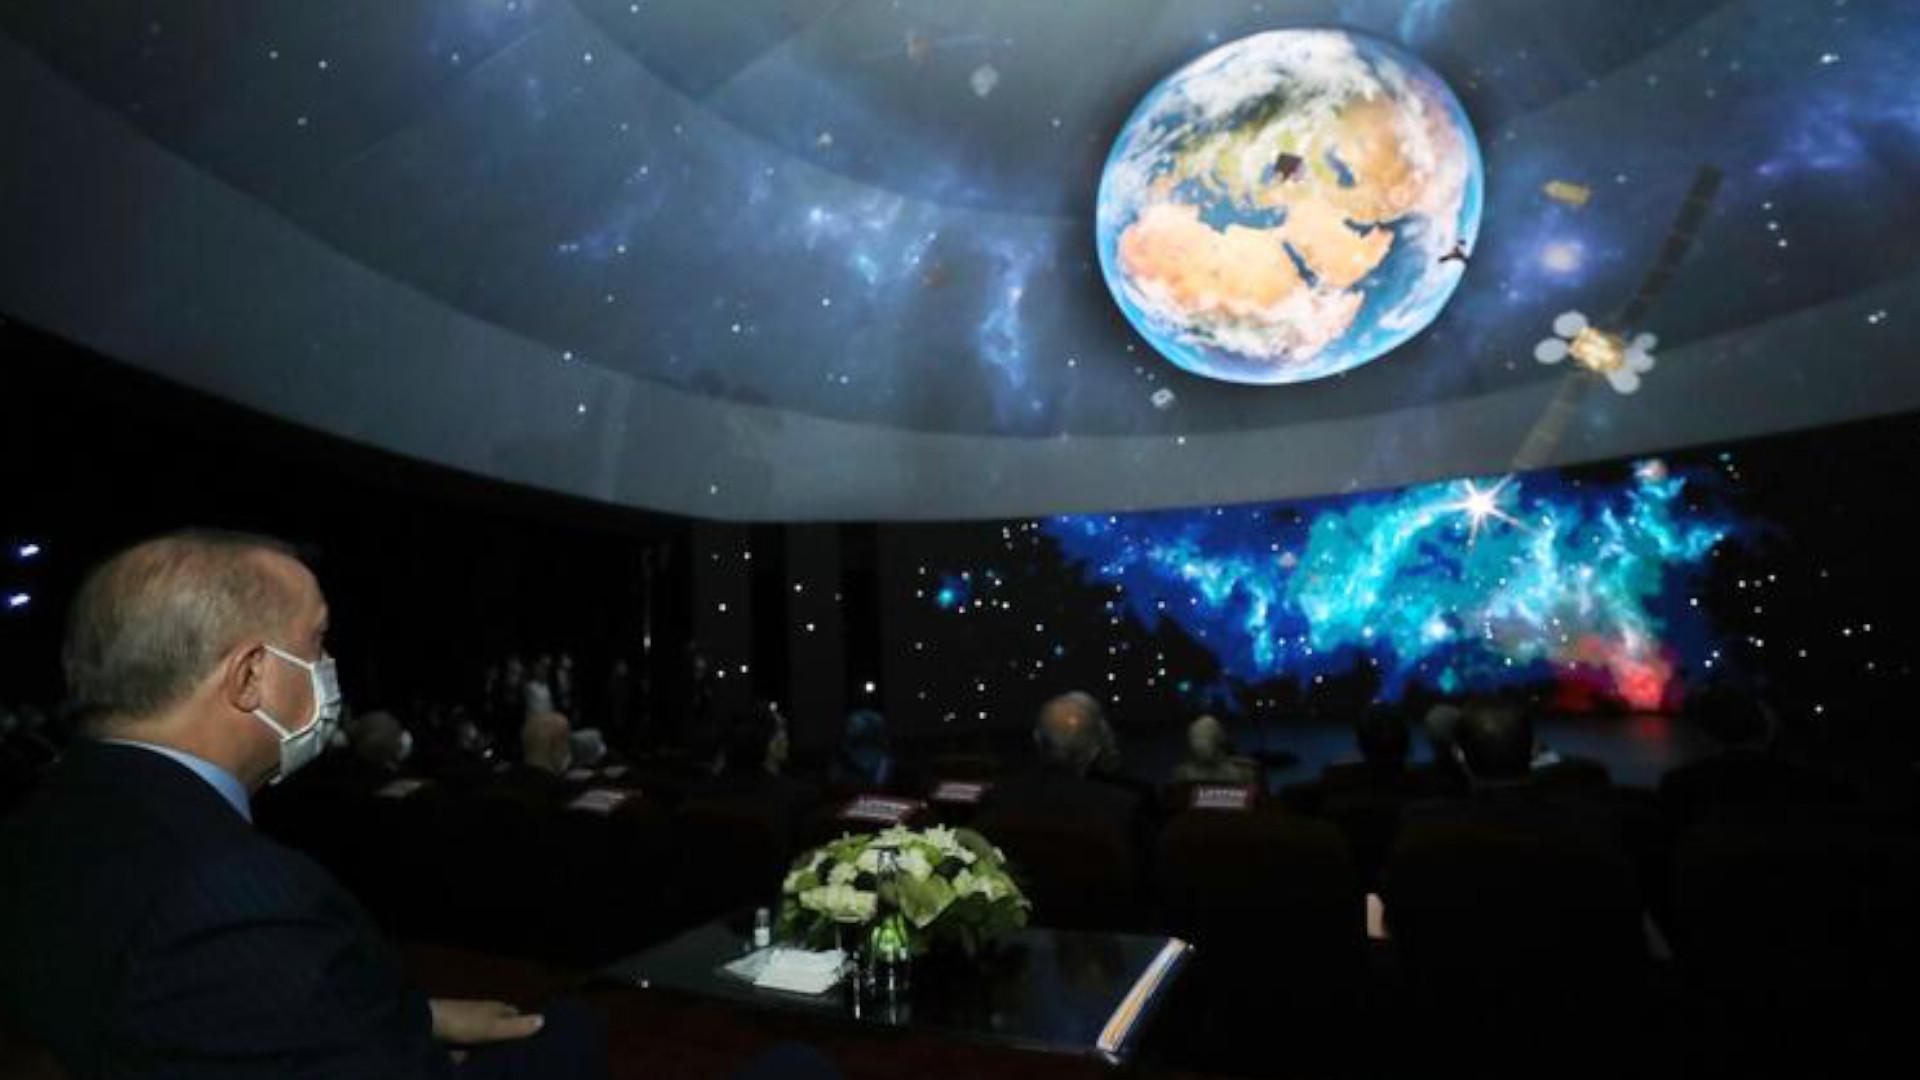 Erdoğan's new spectacle: Sending women into space